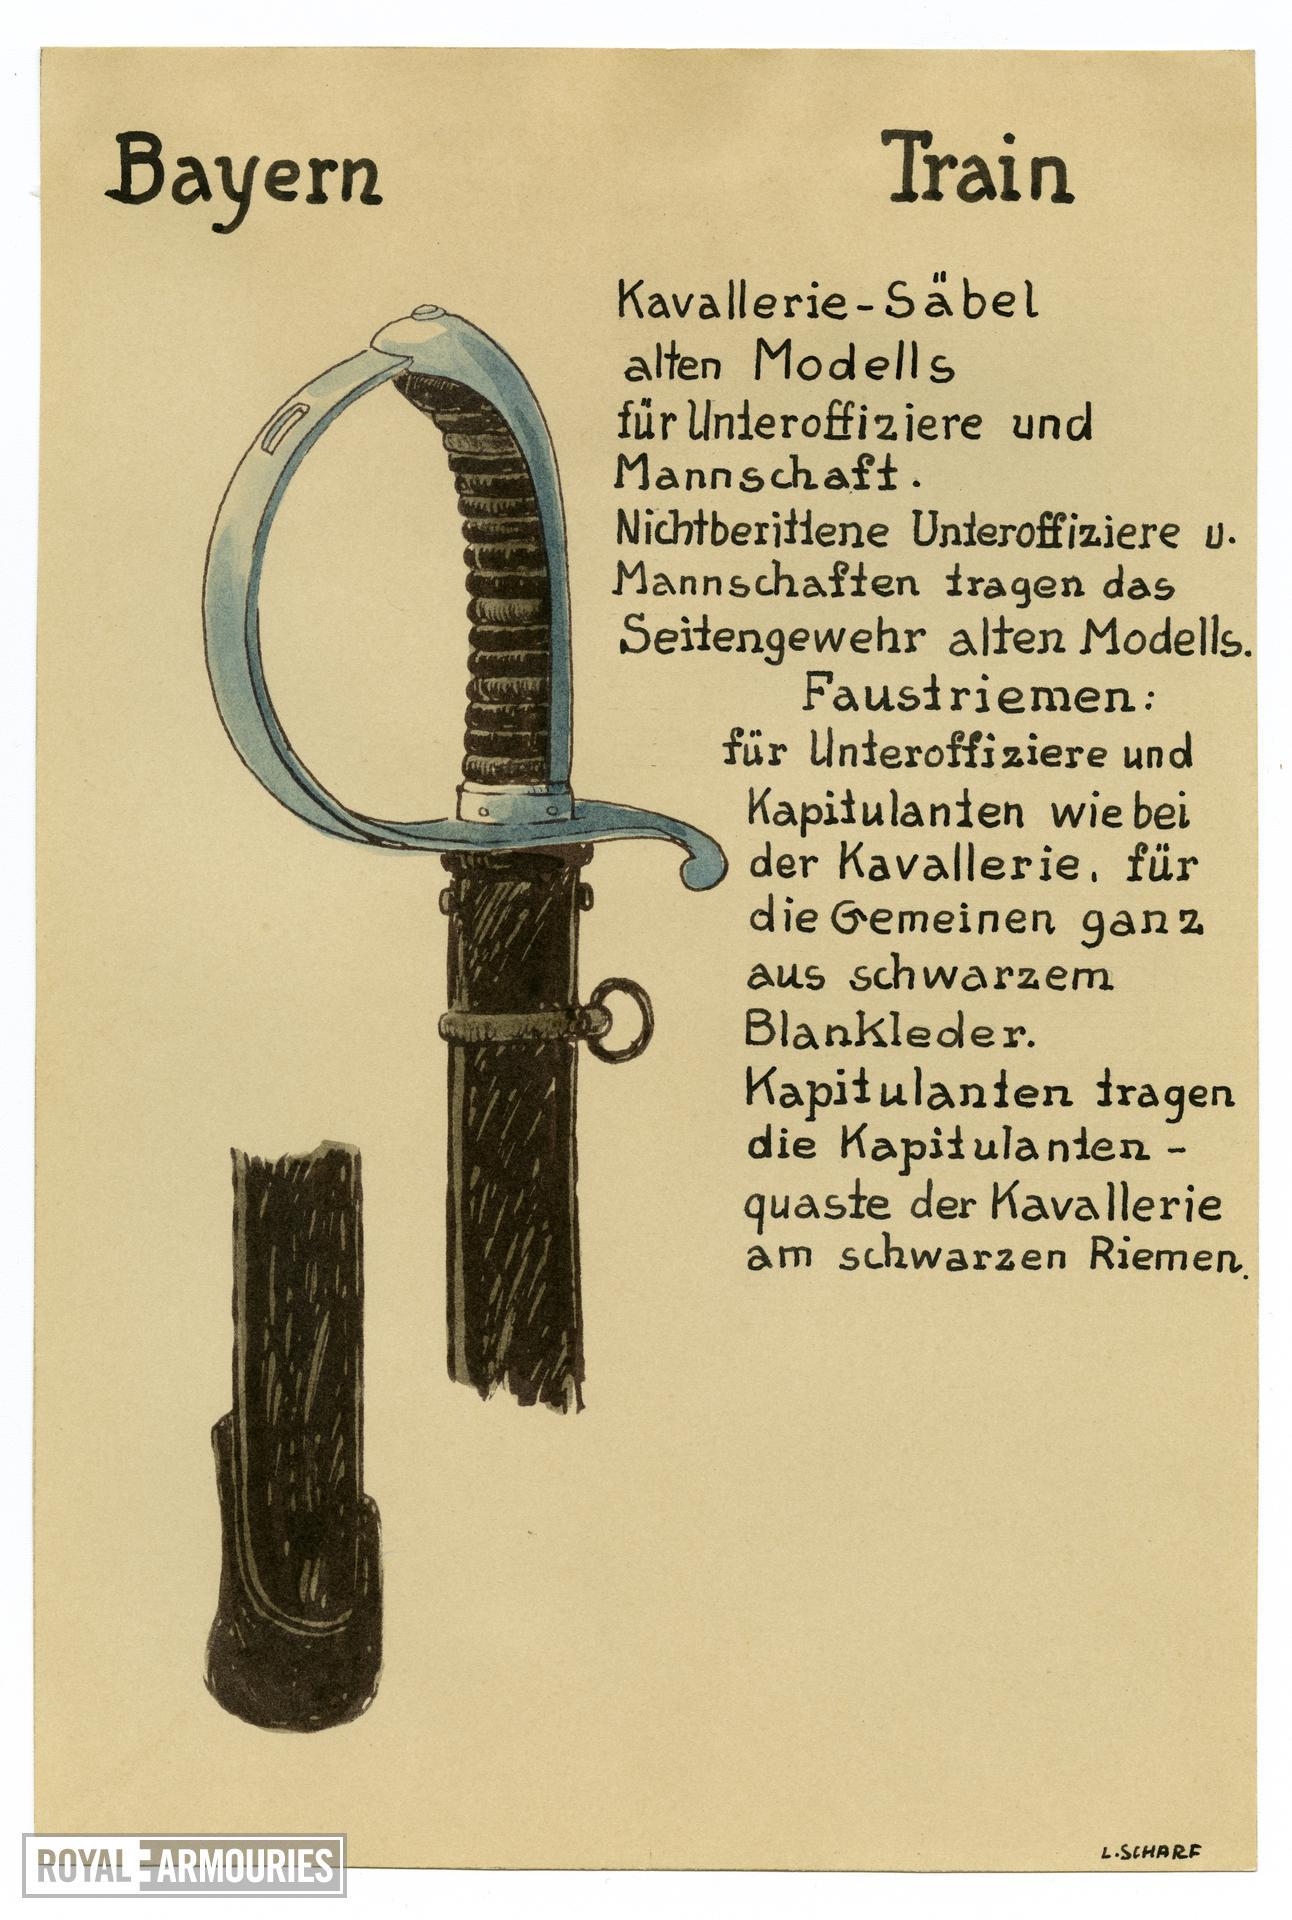 1/7 coloured drawings of German military swords.